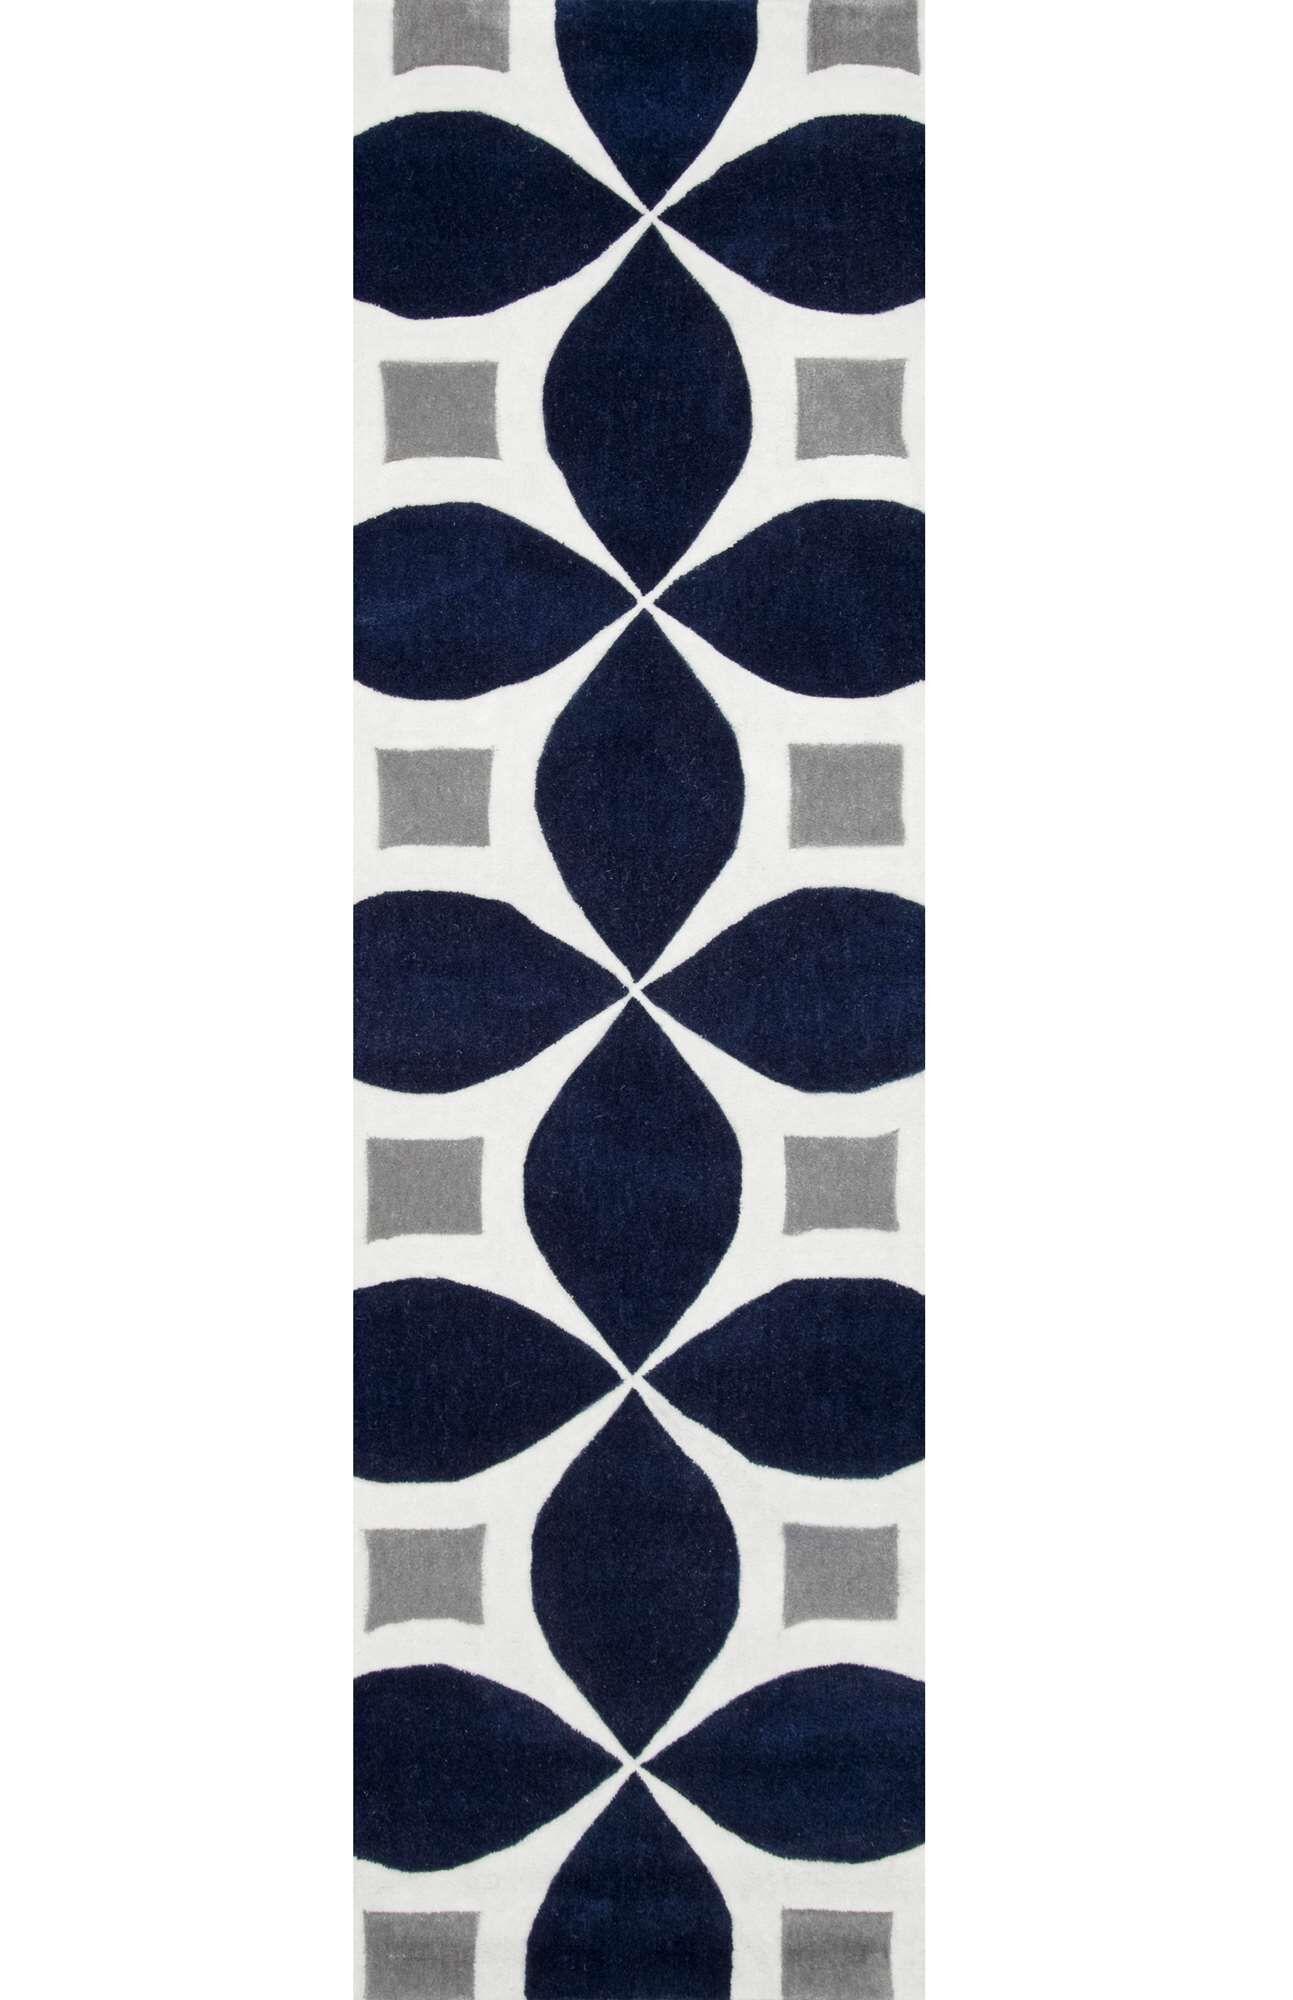 Jamar Handmade Navy Blue/Gray Area Rug Rug Size: Runner 2'6